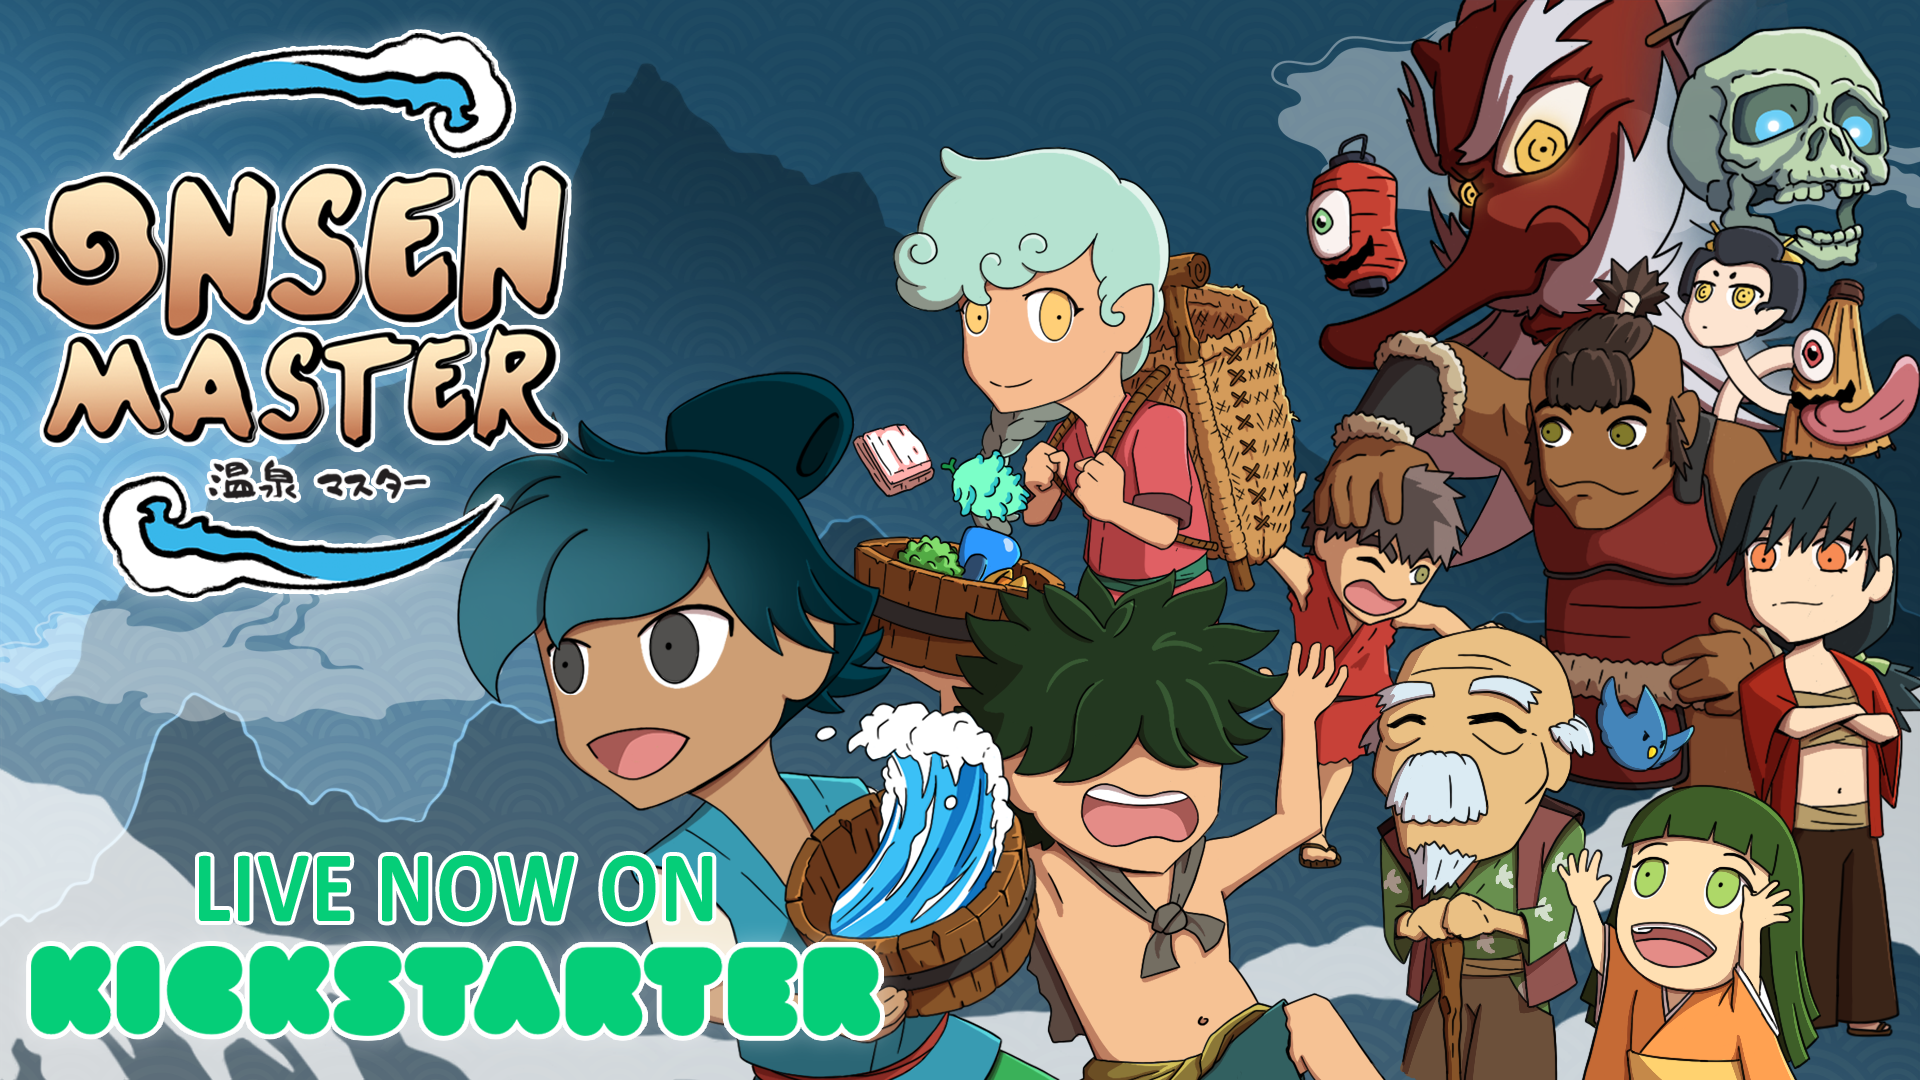 Onsen Master A Hot Spring Management Game Now On Kickstarter Mypotatogames